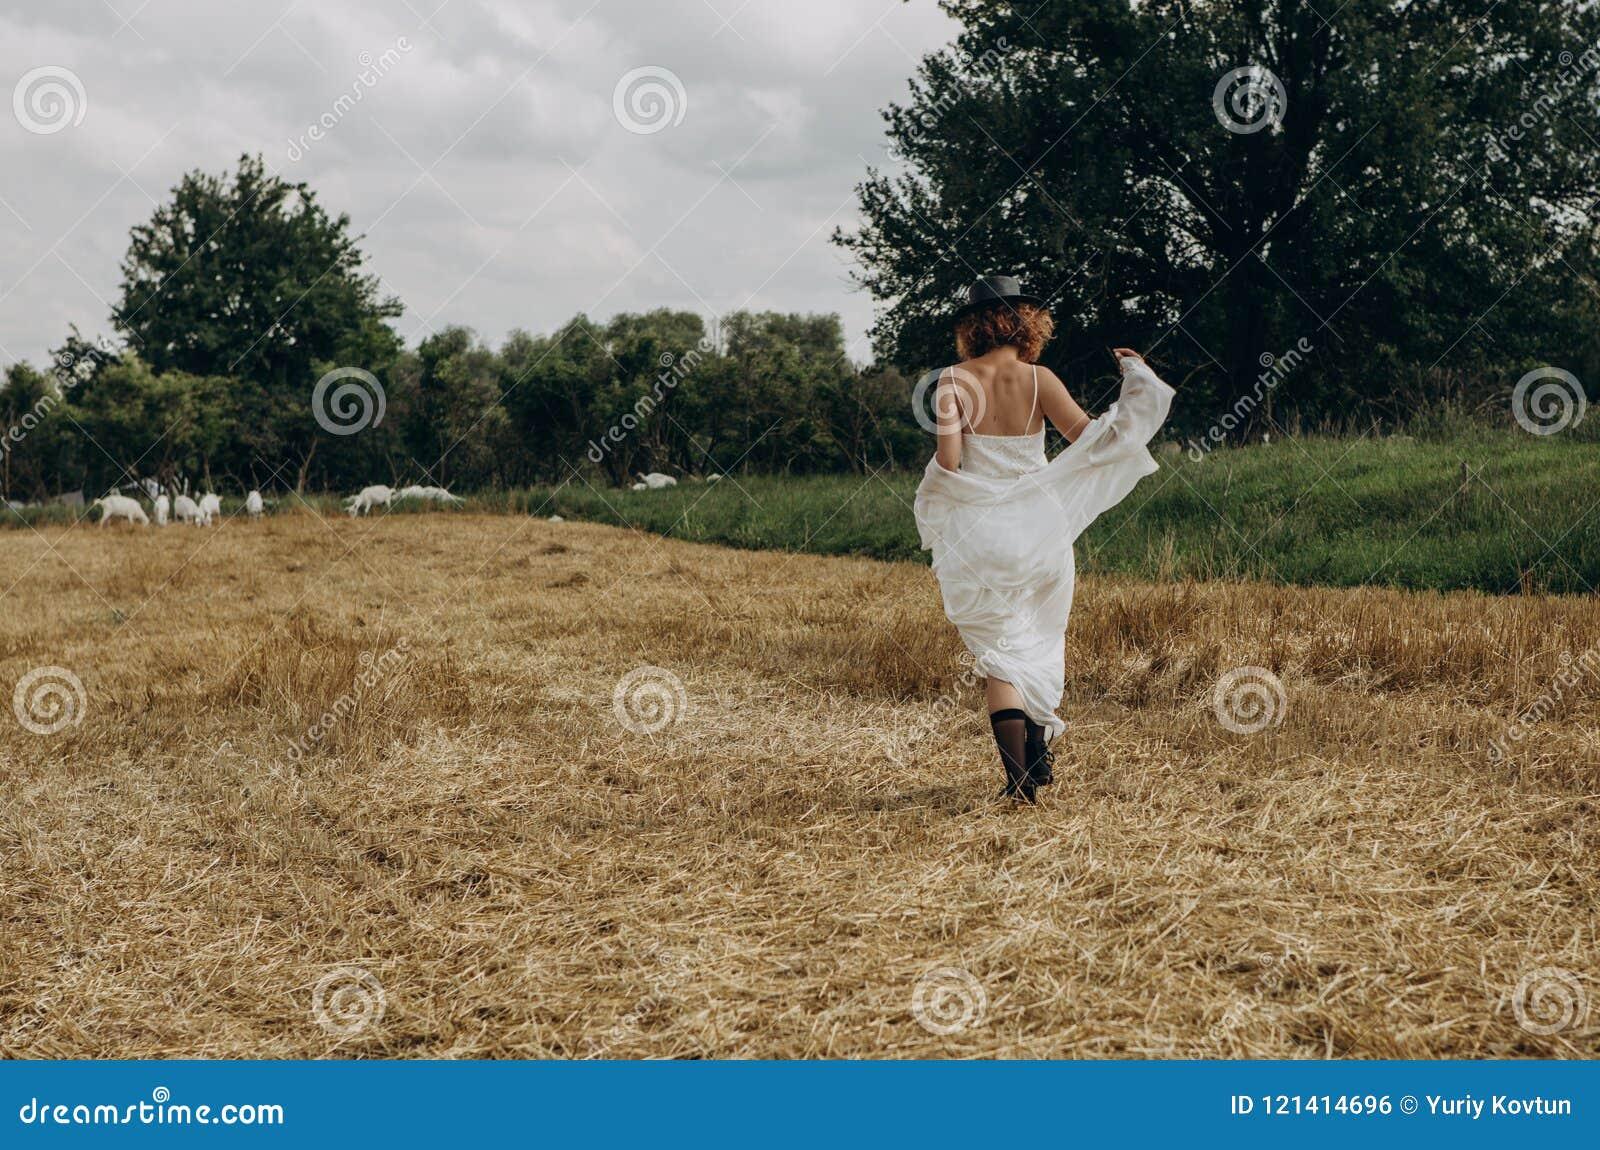 Girl Village Walks Forged Field Dress Hat Goes Stock Photo